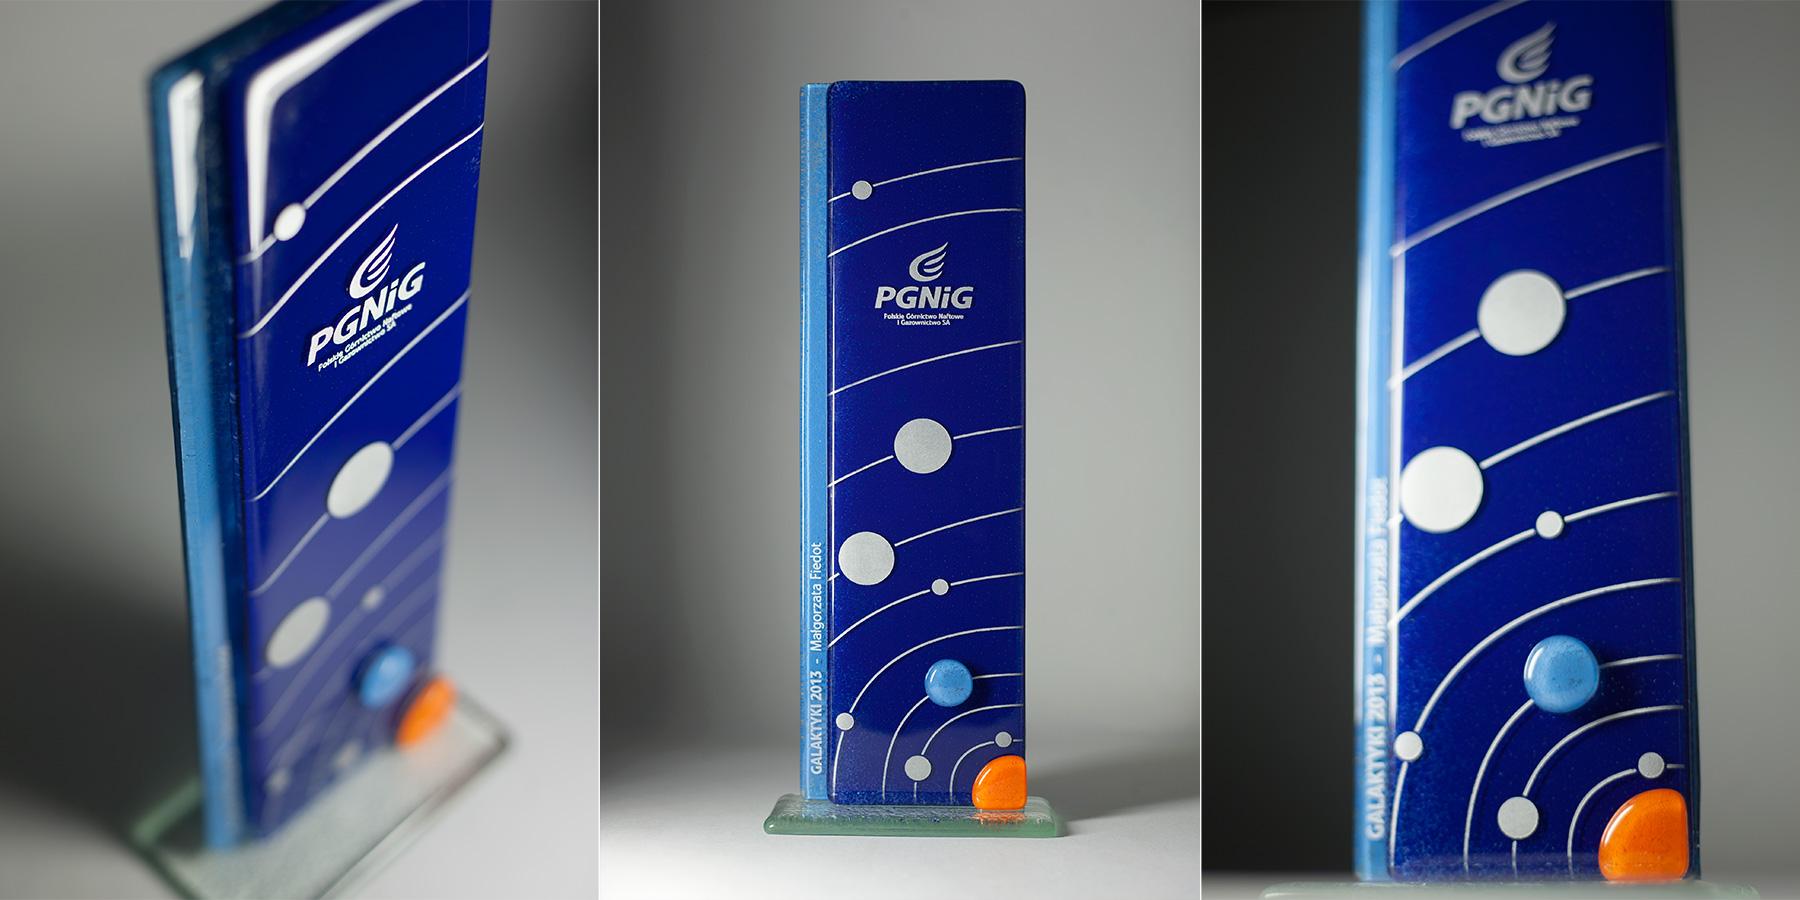 statuetka-galaktyki-konsultant-roku-pgnig